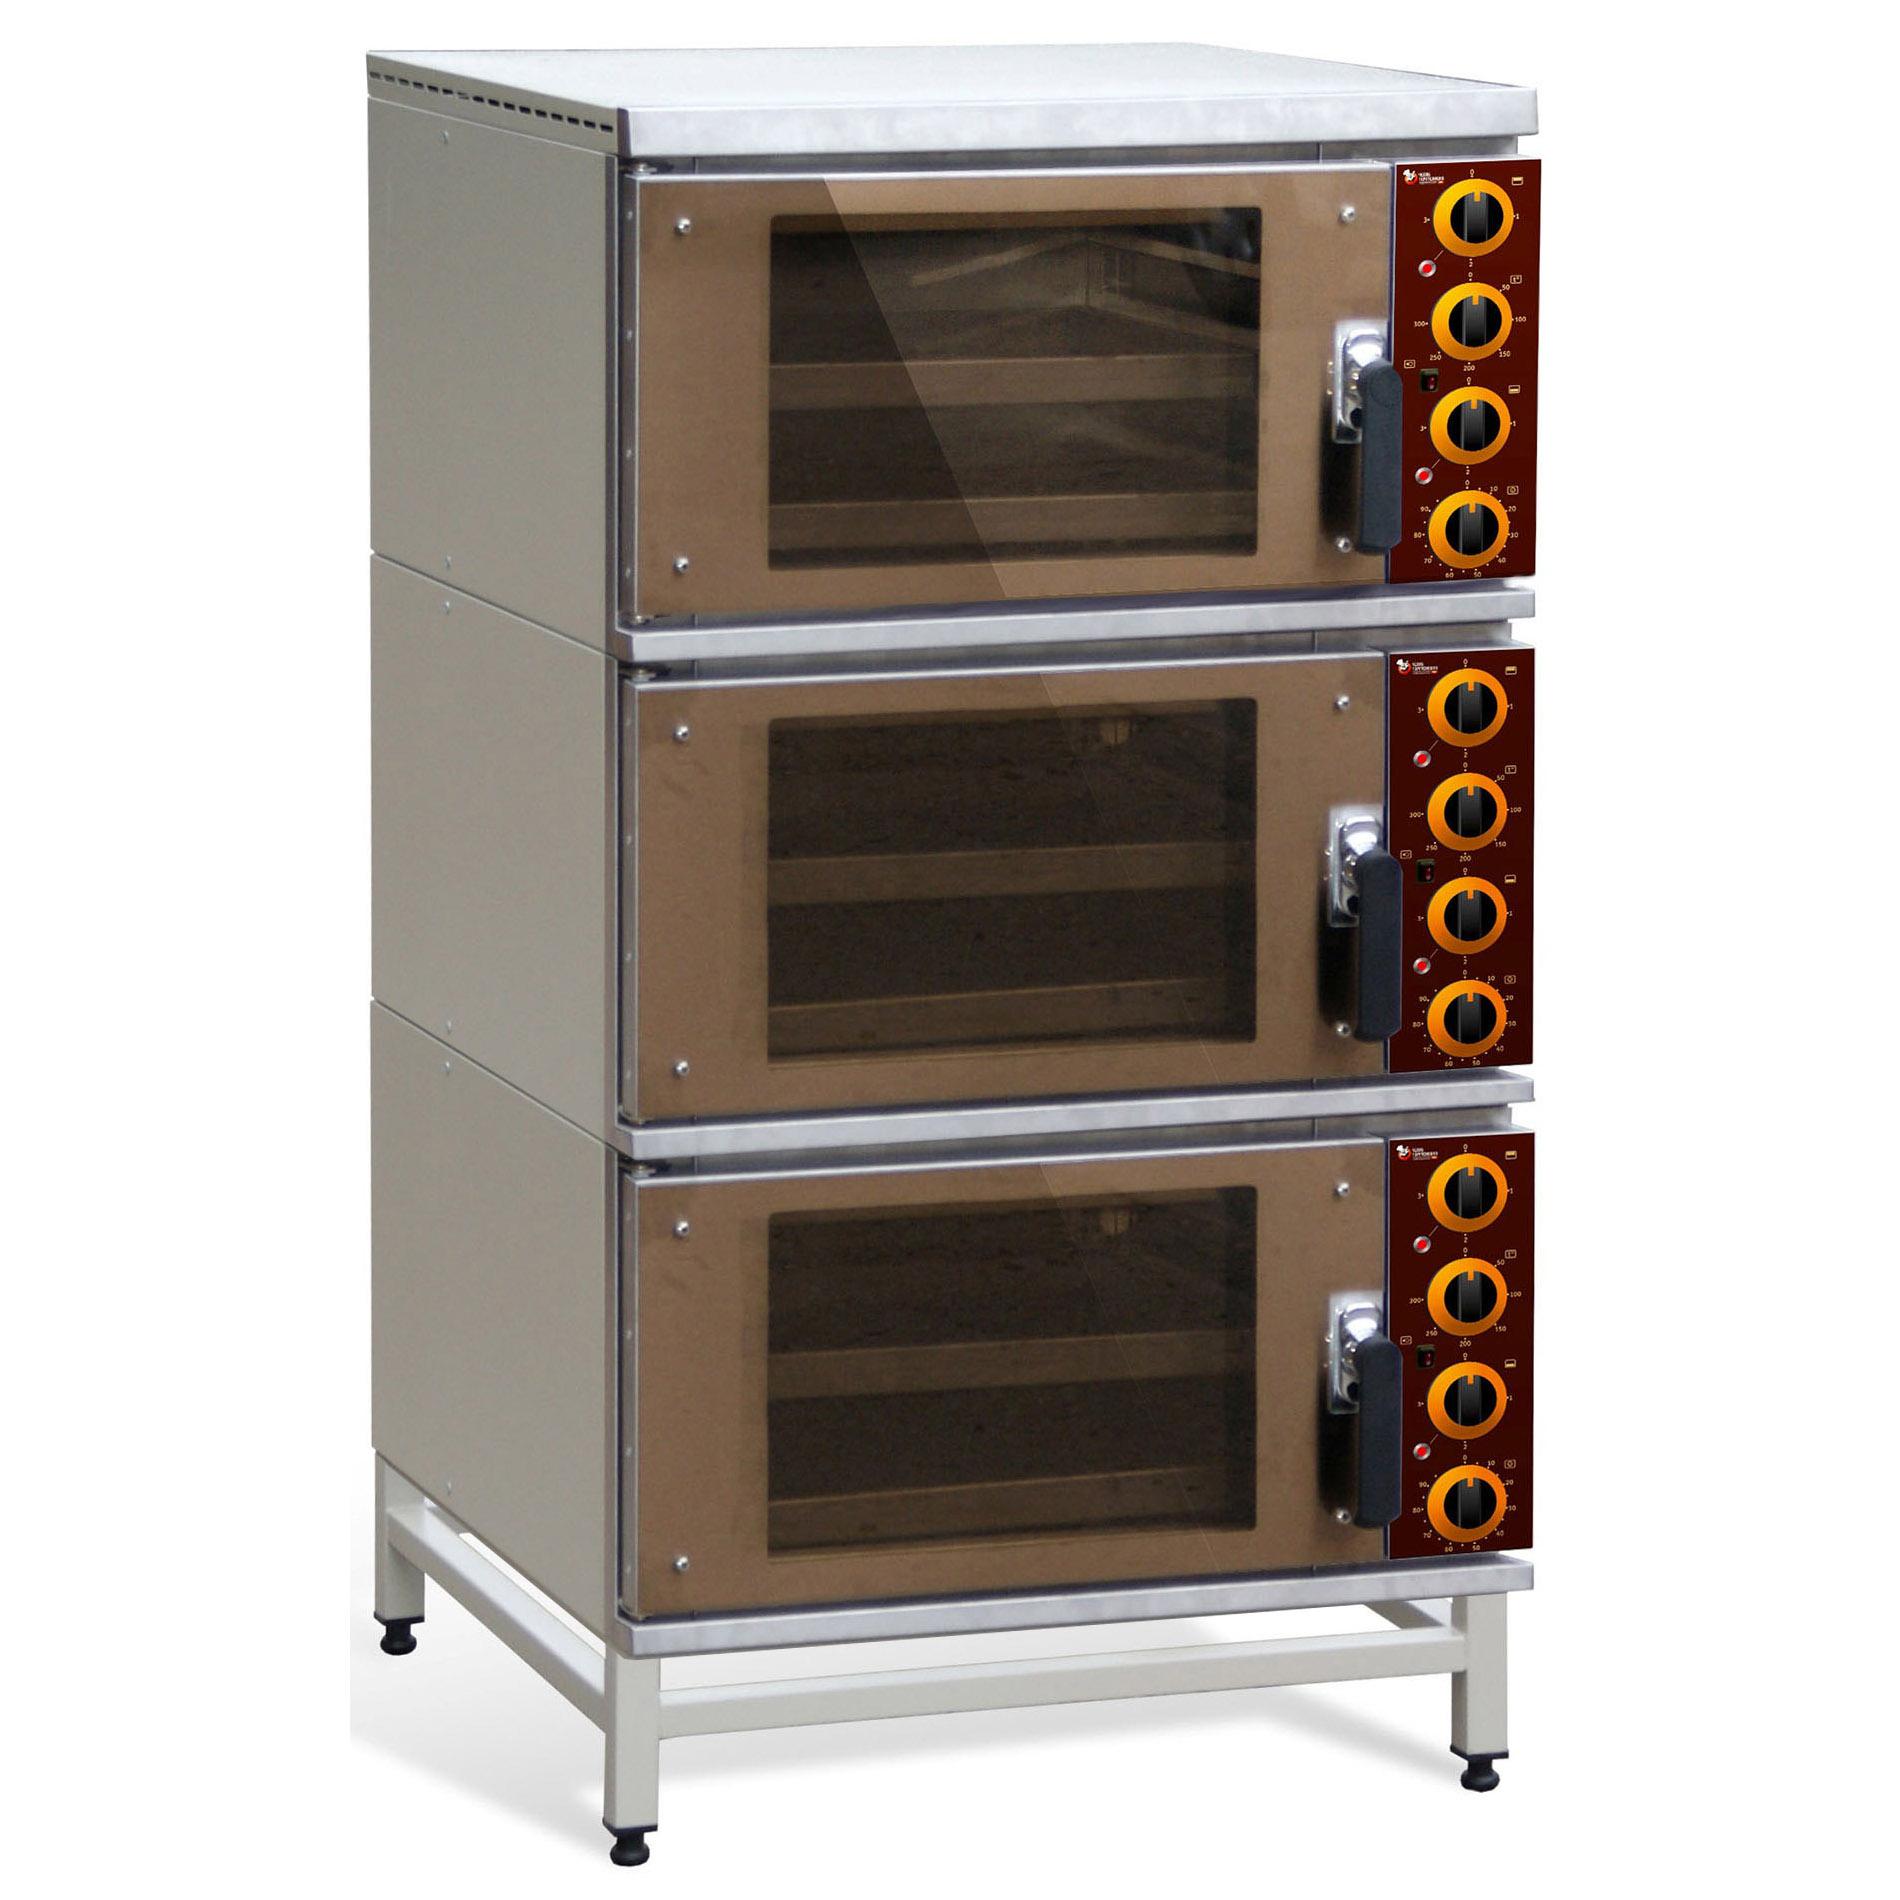 Шкаф жарочный электрический ЧелябТоргТехника ШЖЭС-3